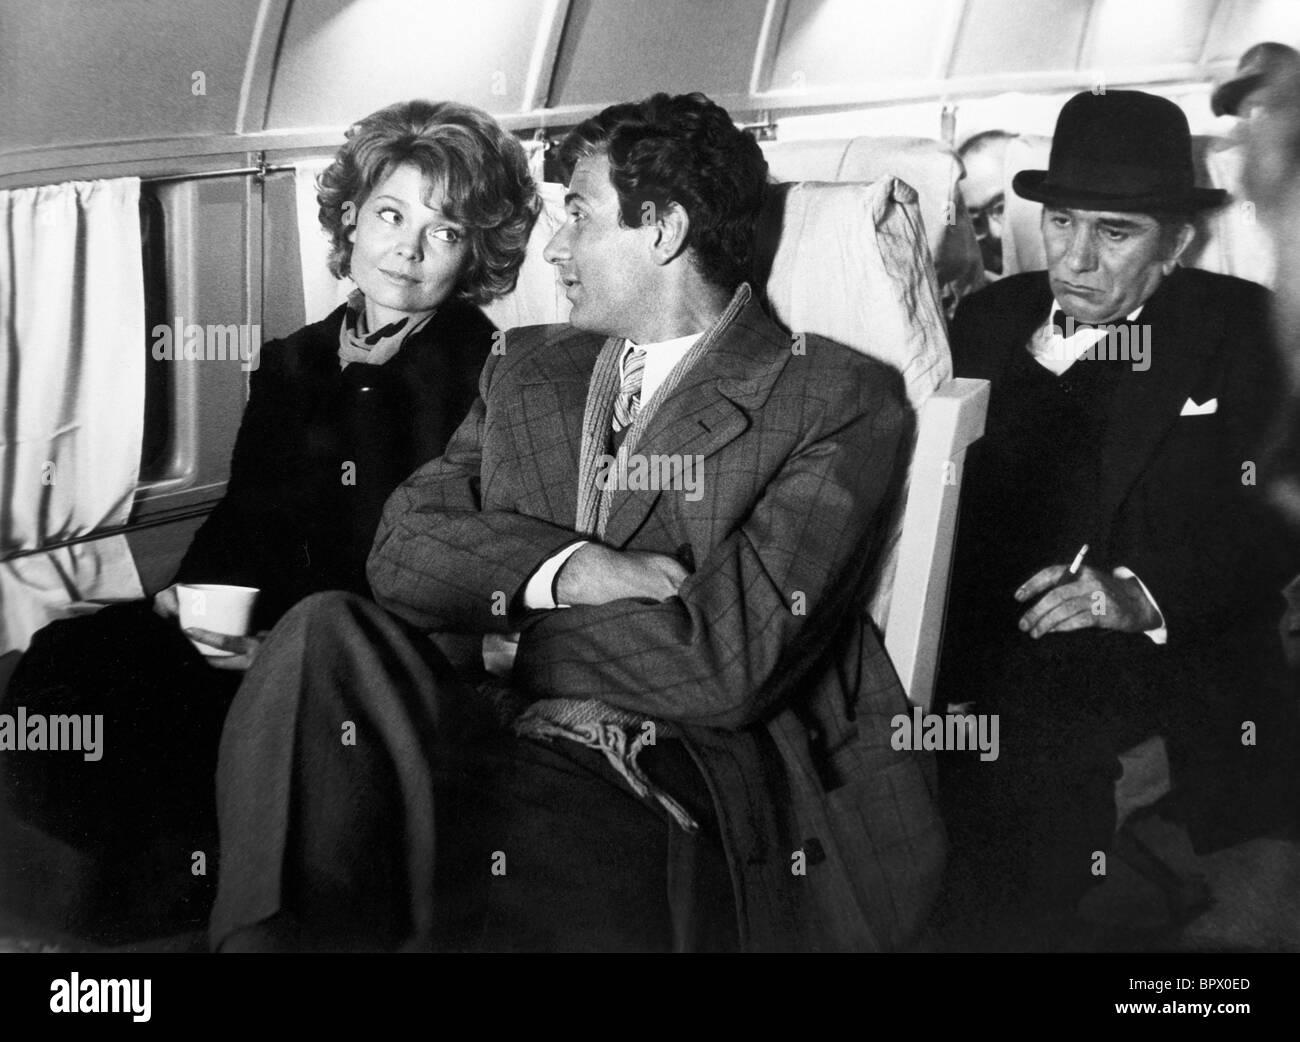 Teheran-43: actors. History of the film